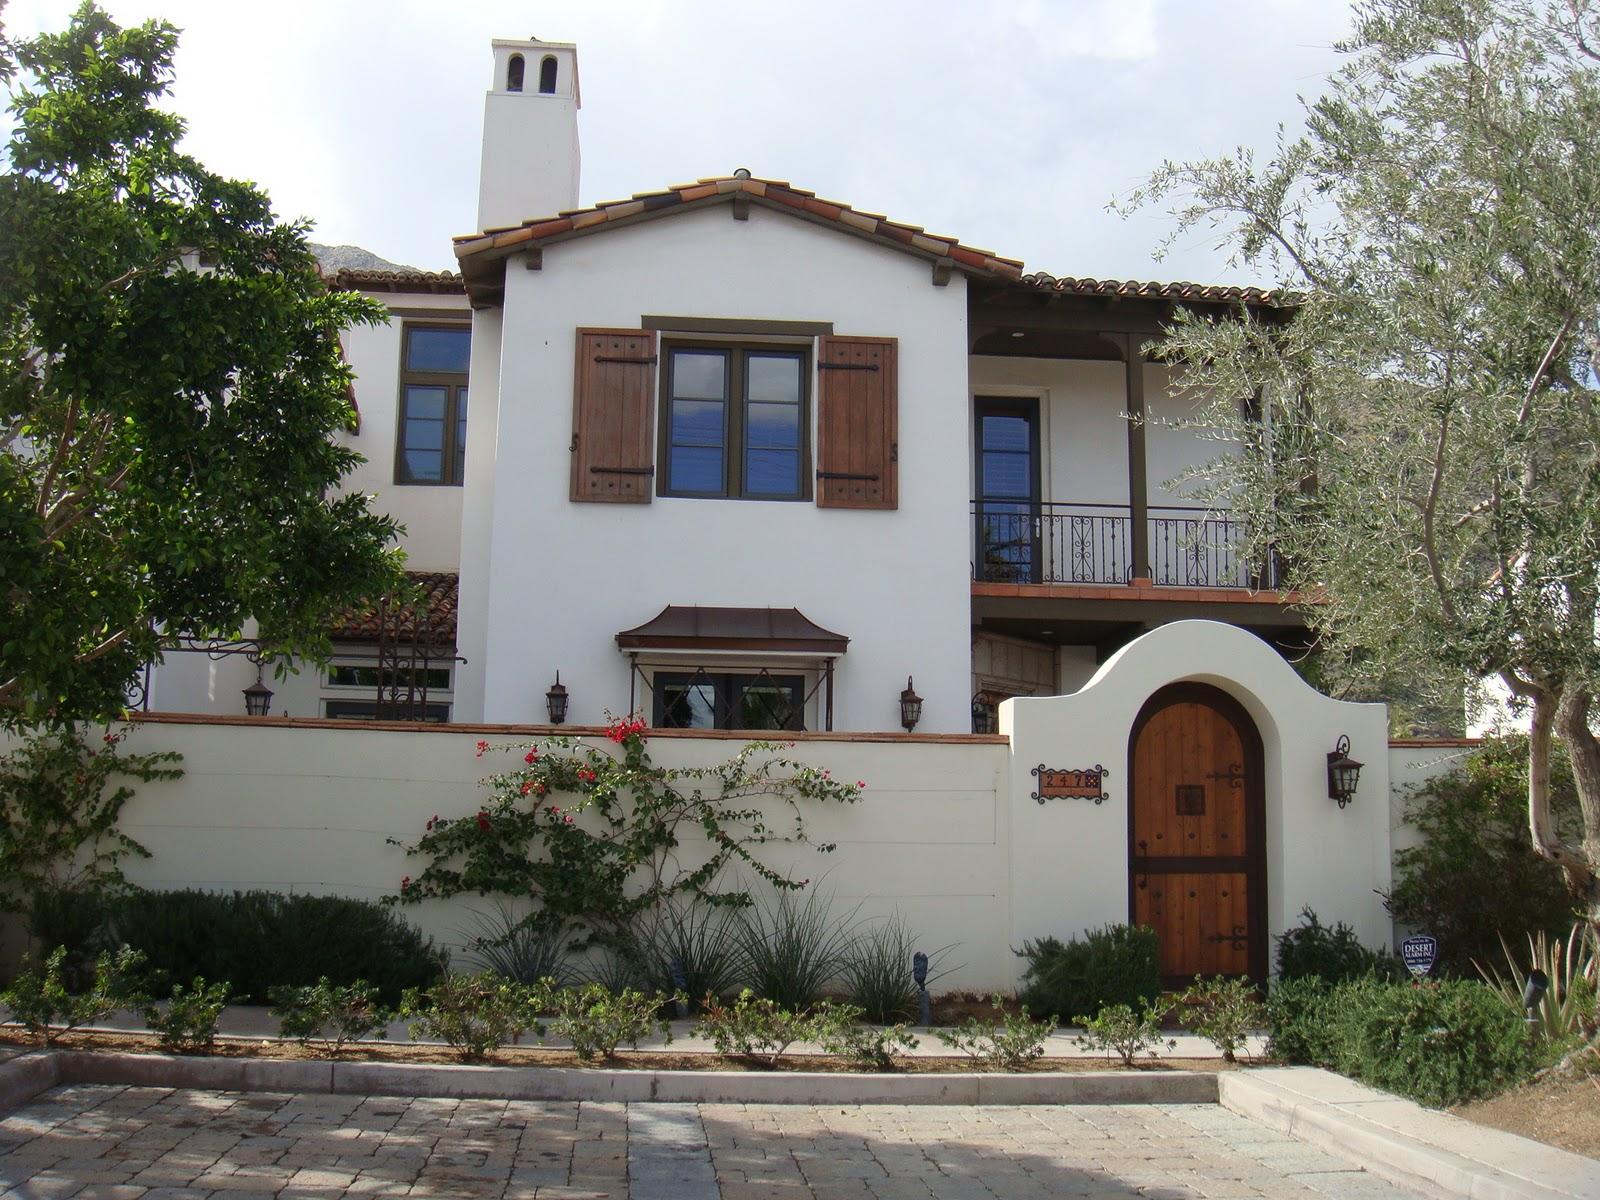 Palm Springs Architecture Mini-tour...